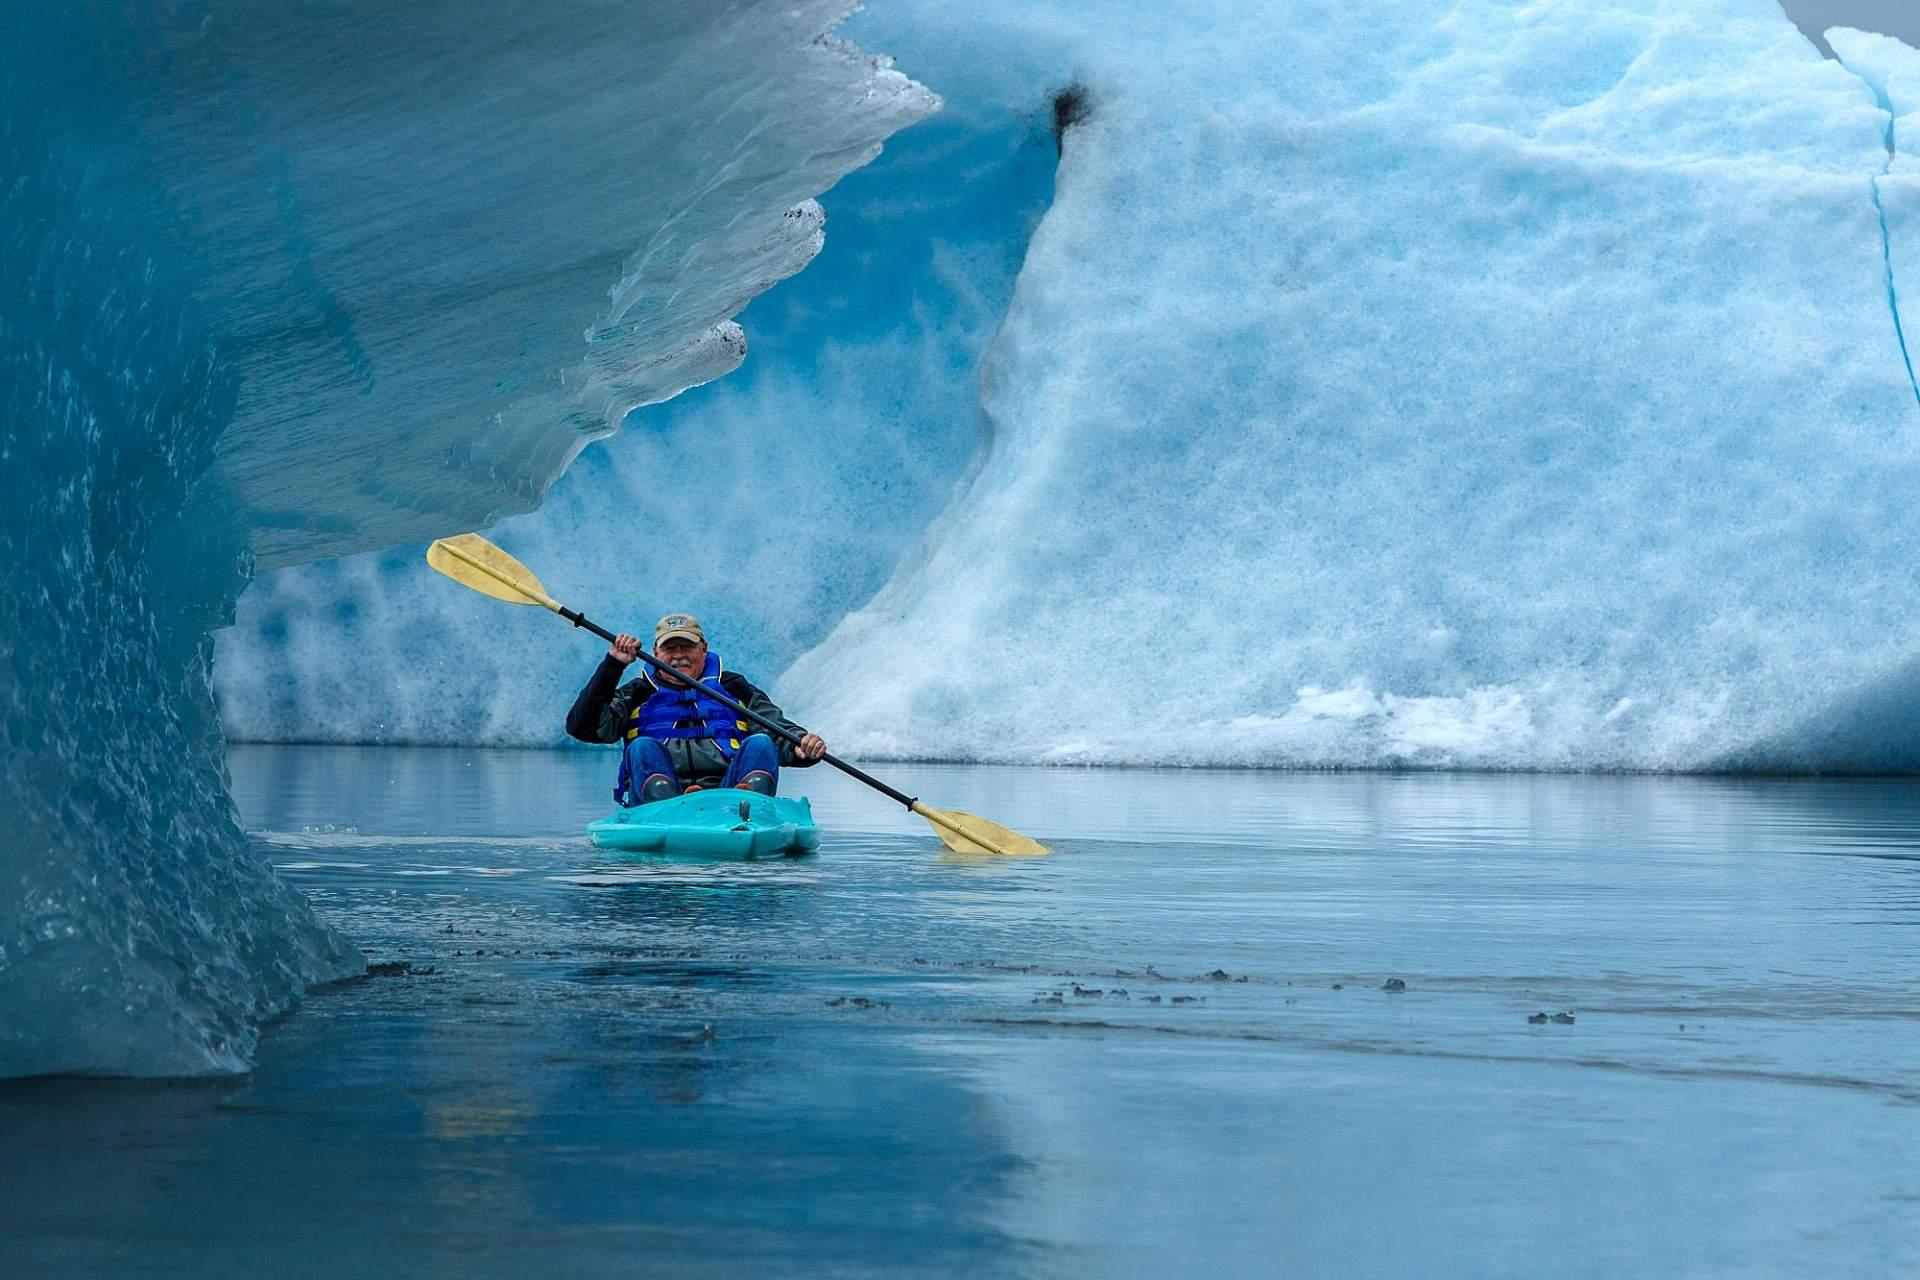 Jeff Schultz Knik Glacier 160716 5 M6834